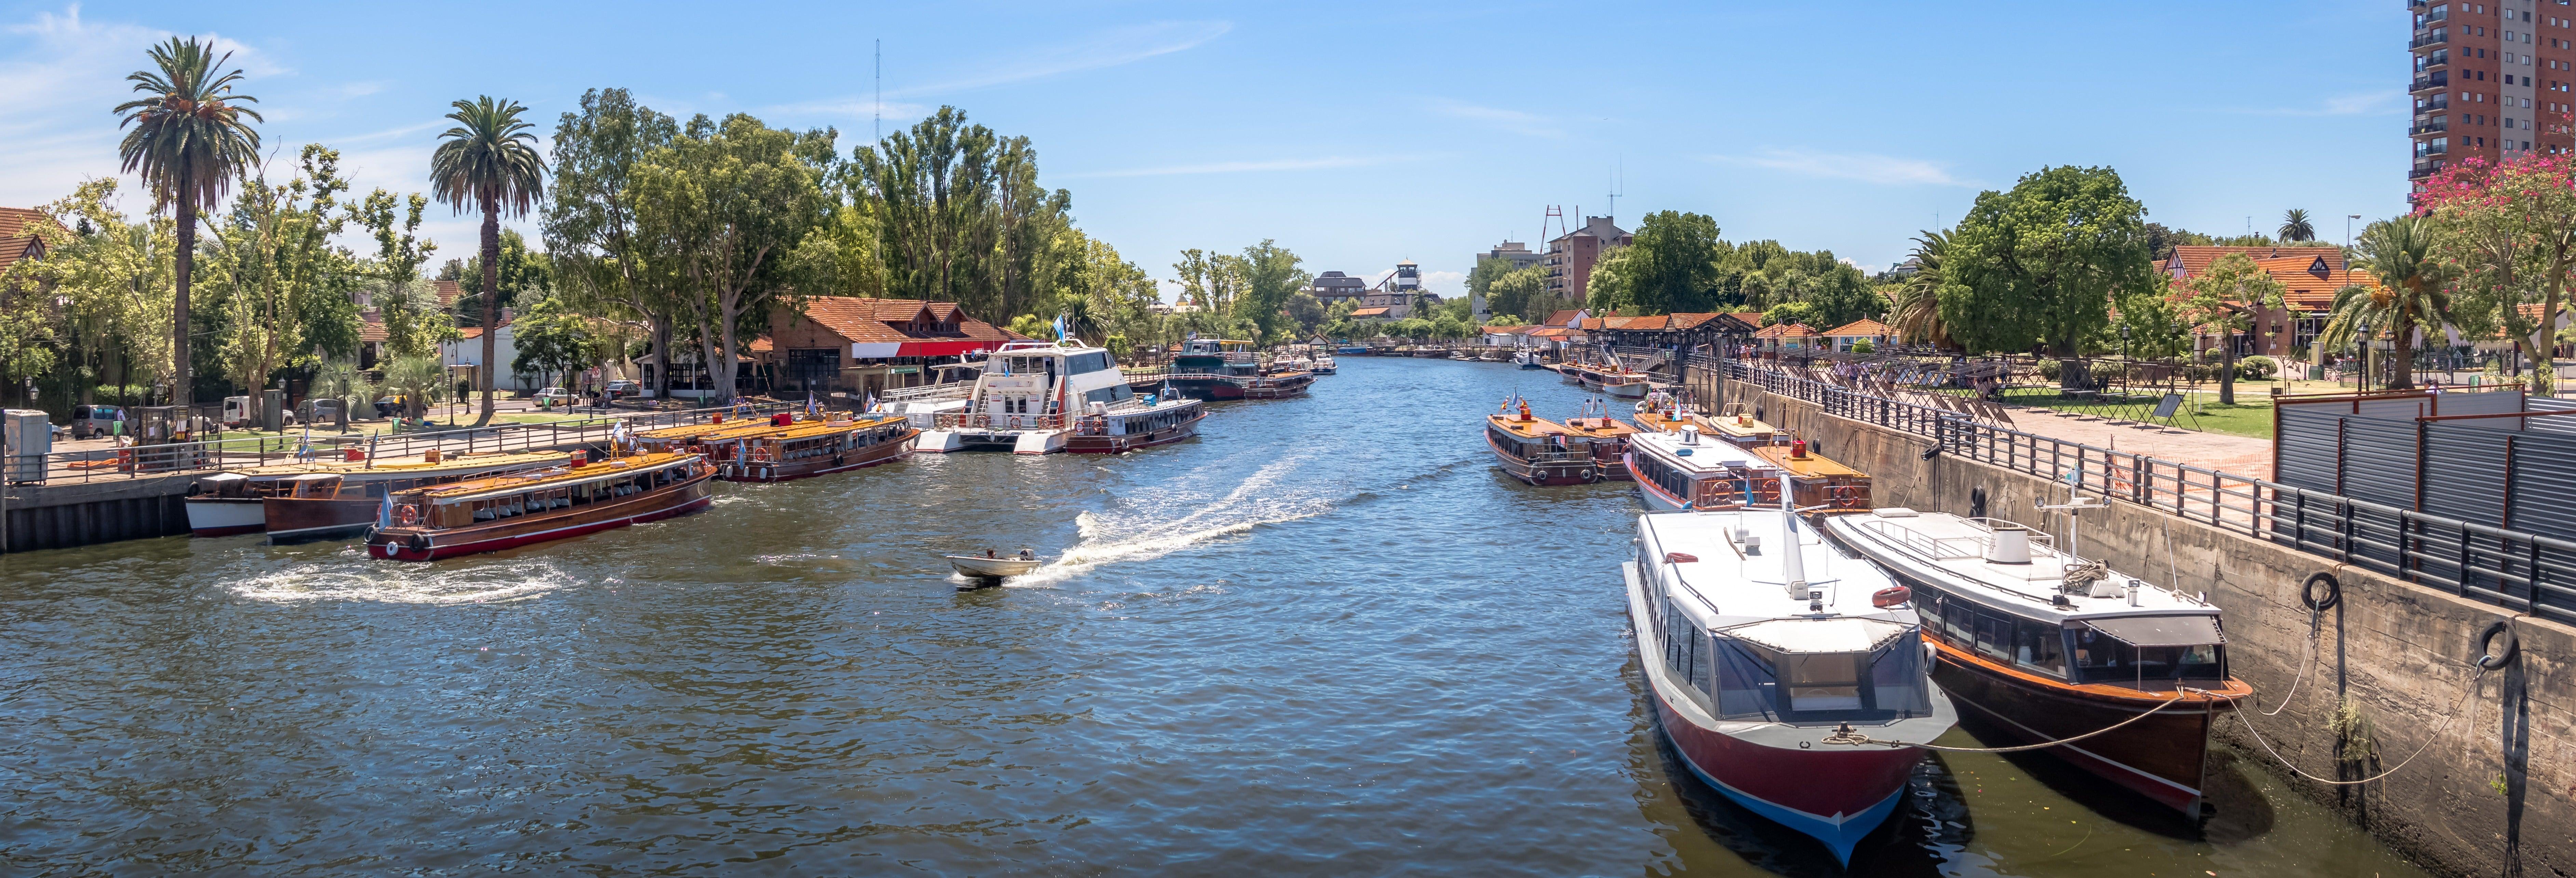 Excursão a Tigre de barco